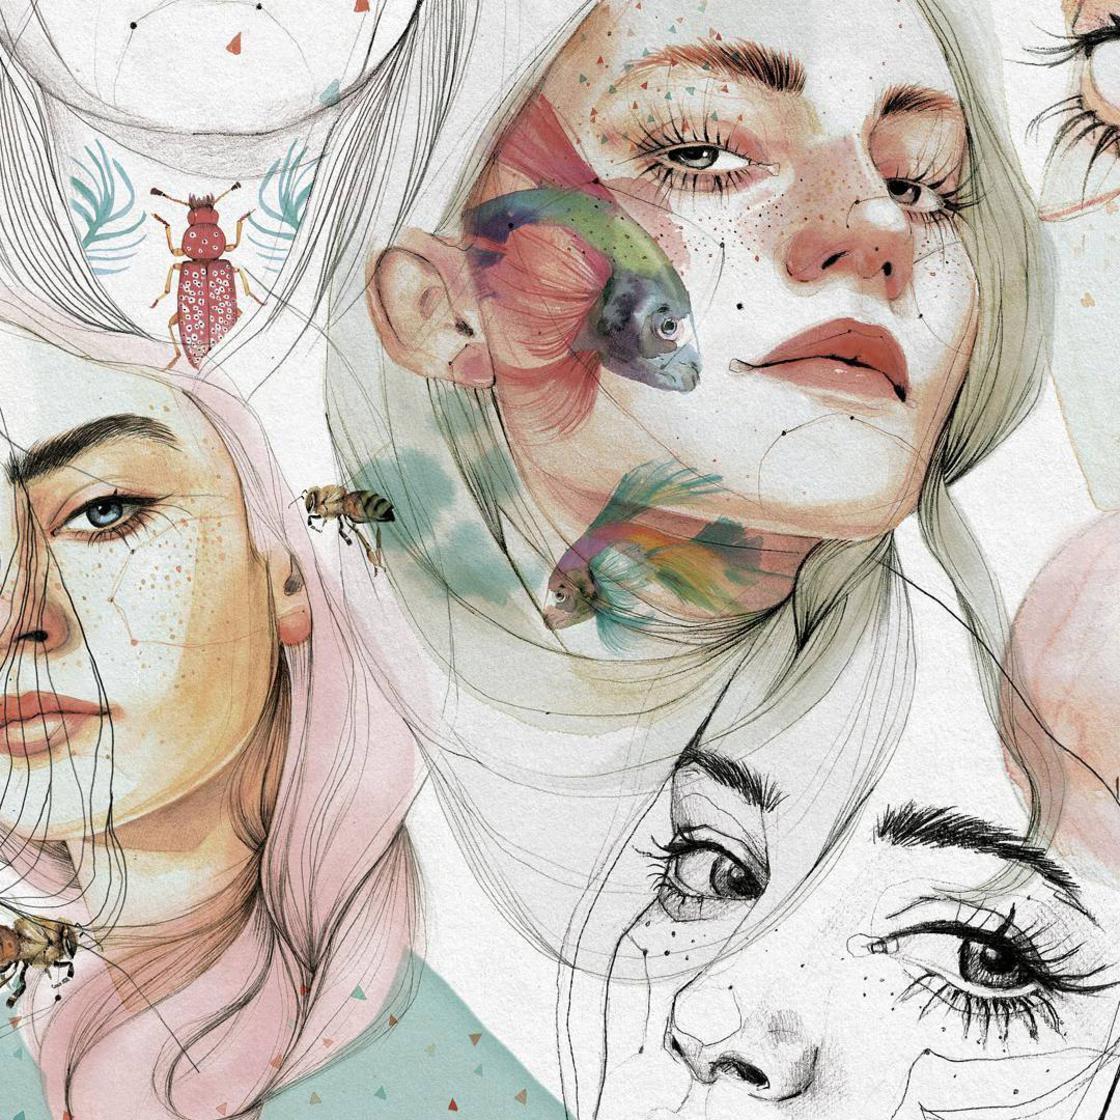 ana-santos-girl-portraits-24.jpg